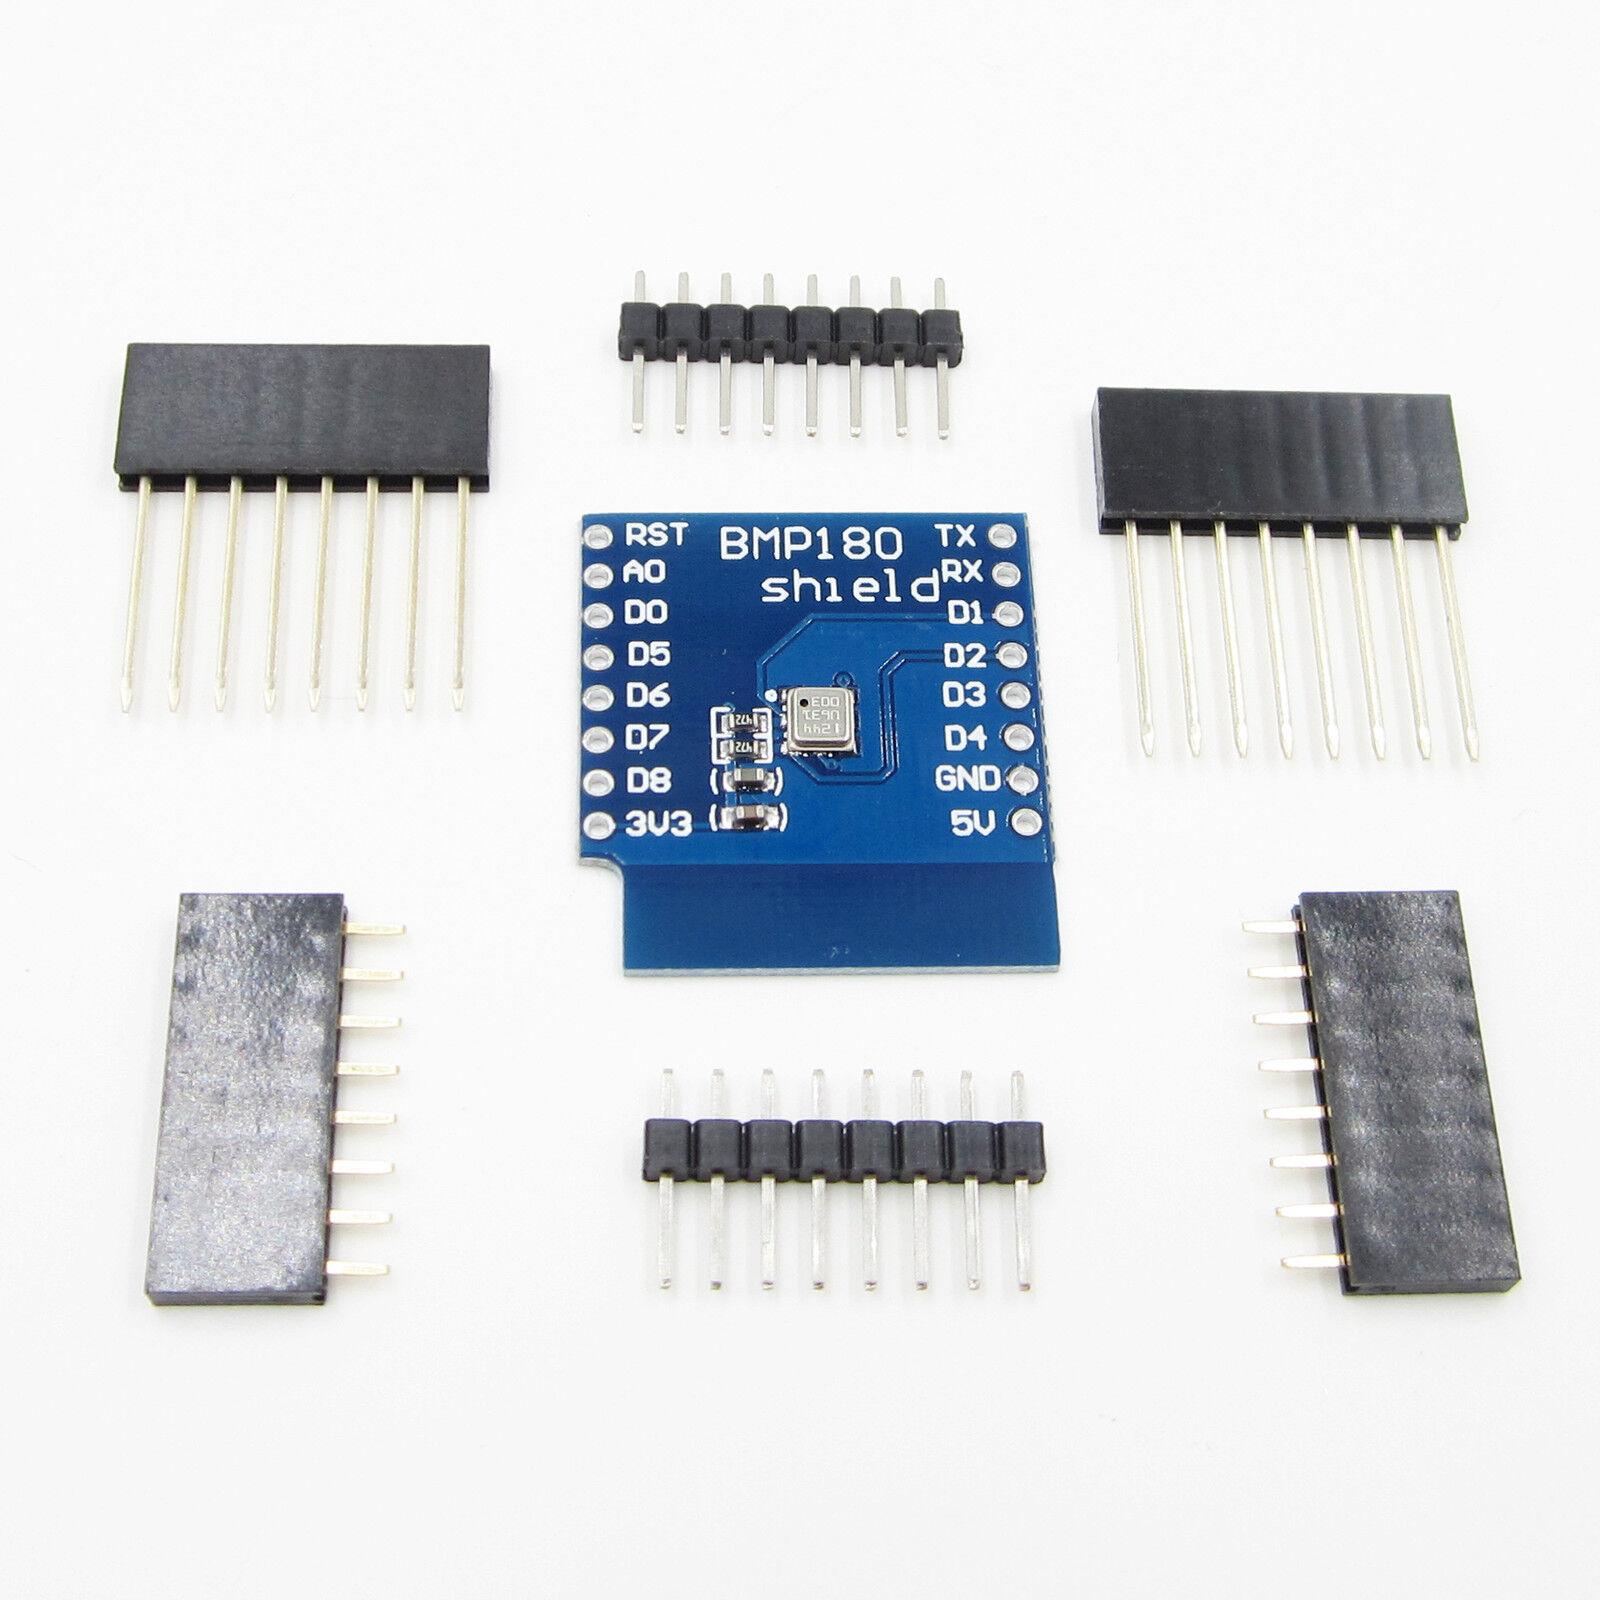 180 Replace 085 Digital Barometric Pressure Sensor Module For Ccl Anti Etching Pcb Circuit Board Ink Marker Pen Diy Ebay Norton Secured Powered By Verisign